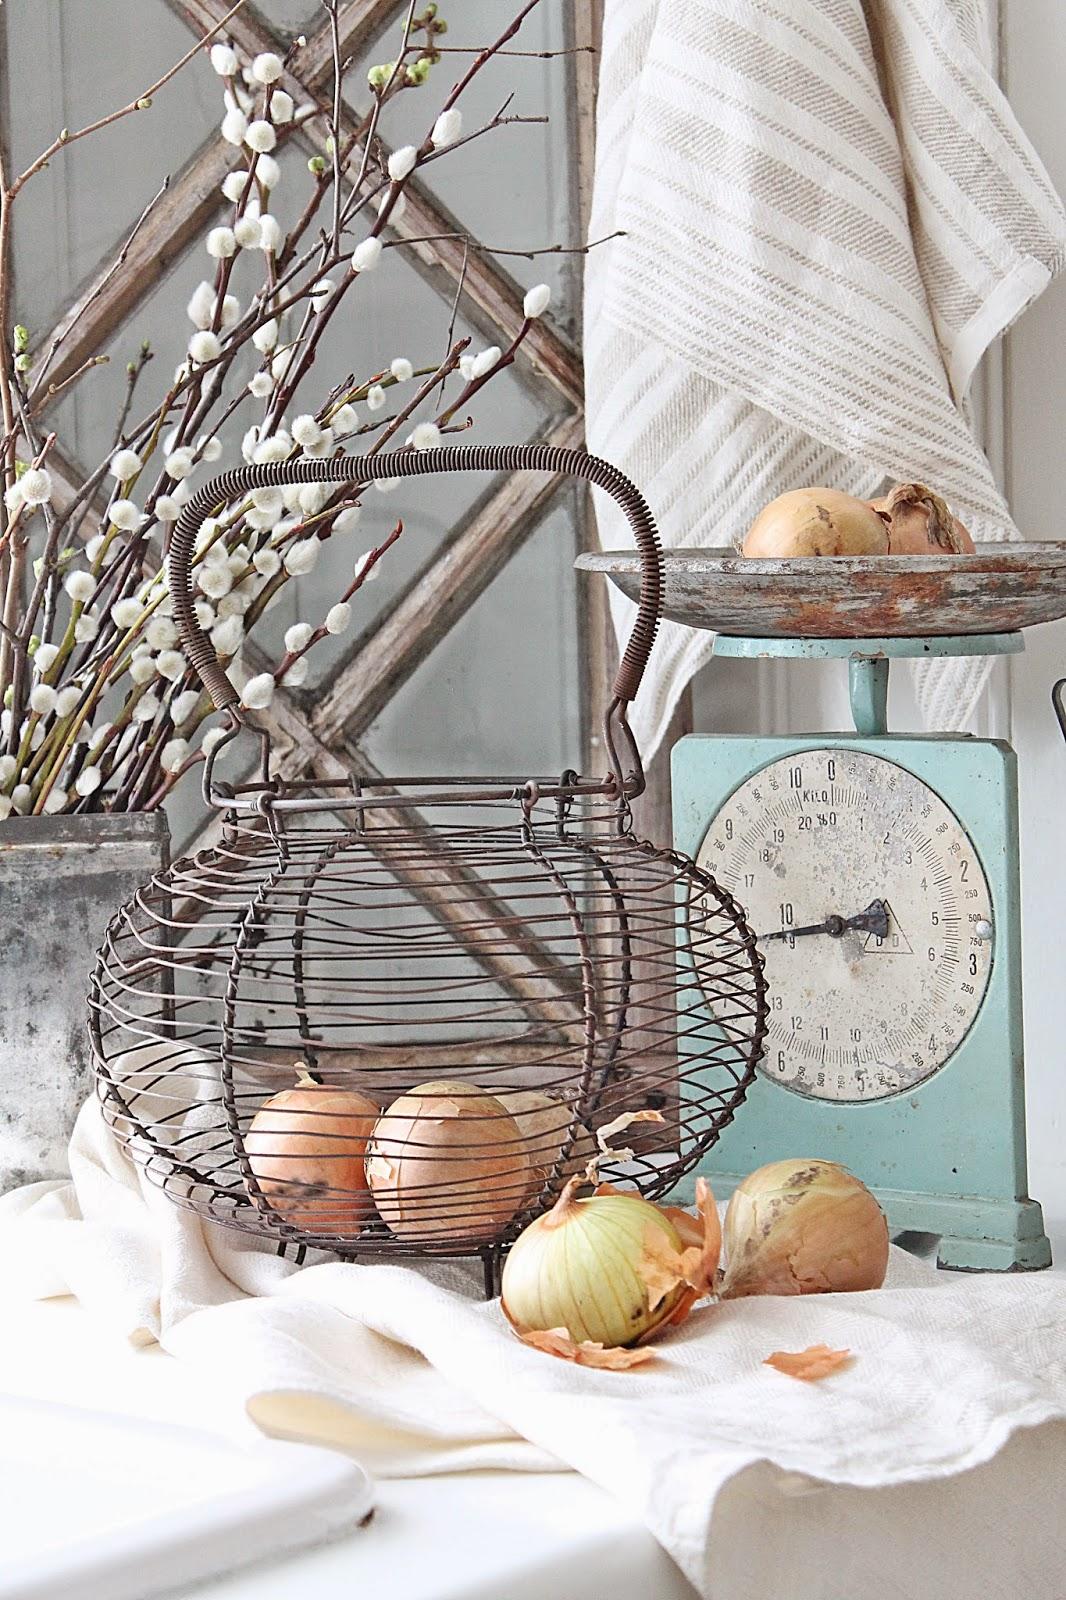 dekor/vesennii-dekor-svoimi-rukami-foto-23.jpg